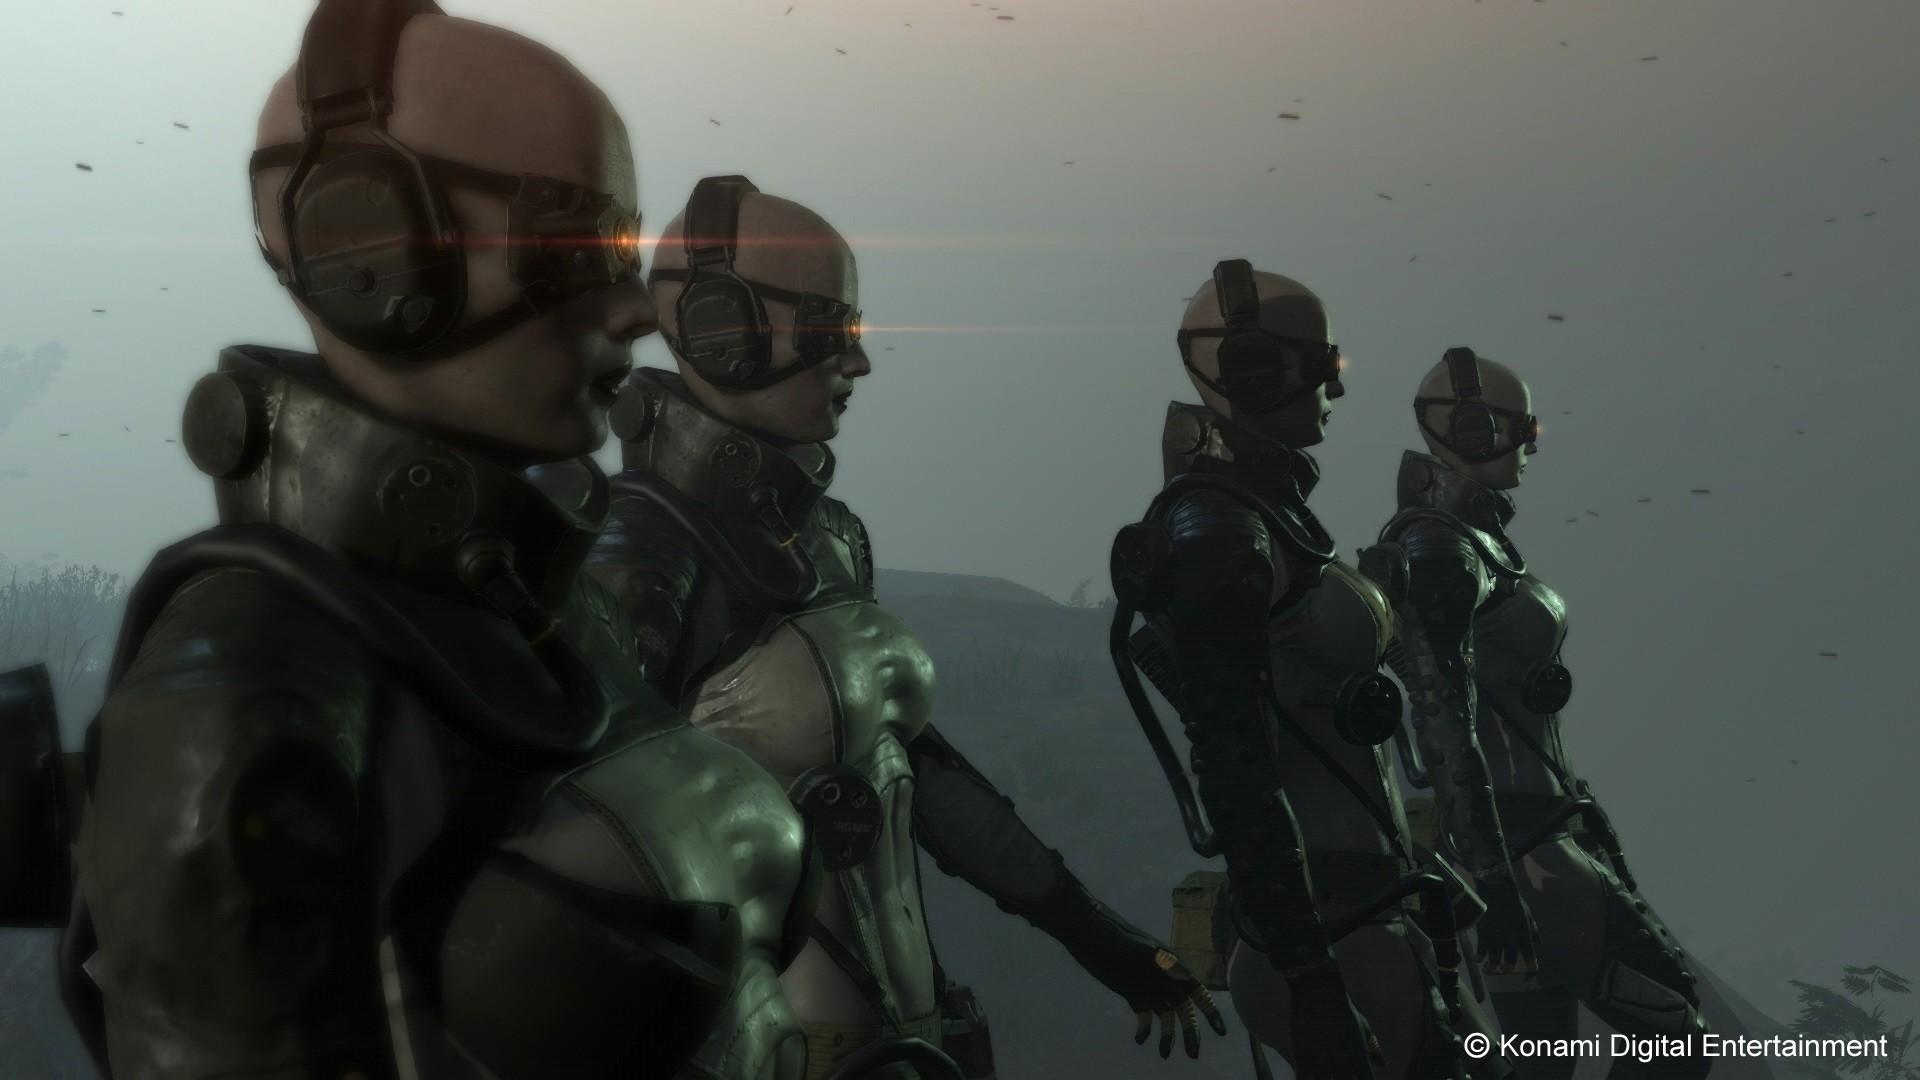 Image – Metal-gear-solid-5-the-phantom-pain 1434525076.jpg | Metal Gear  Wiki | FANDOM powered by Wikia